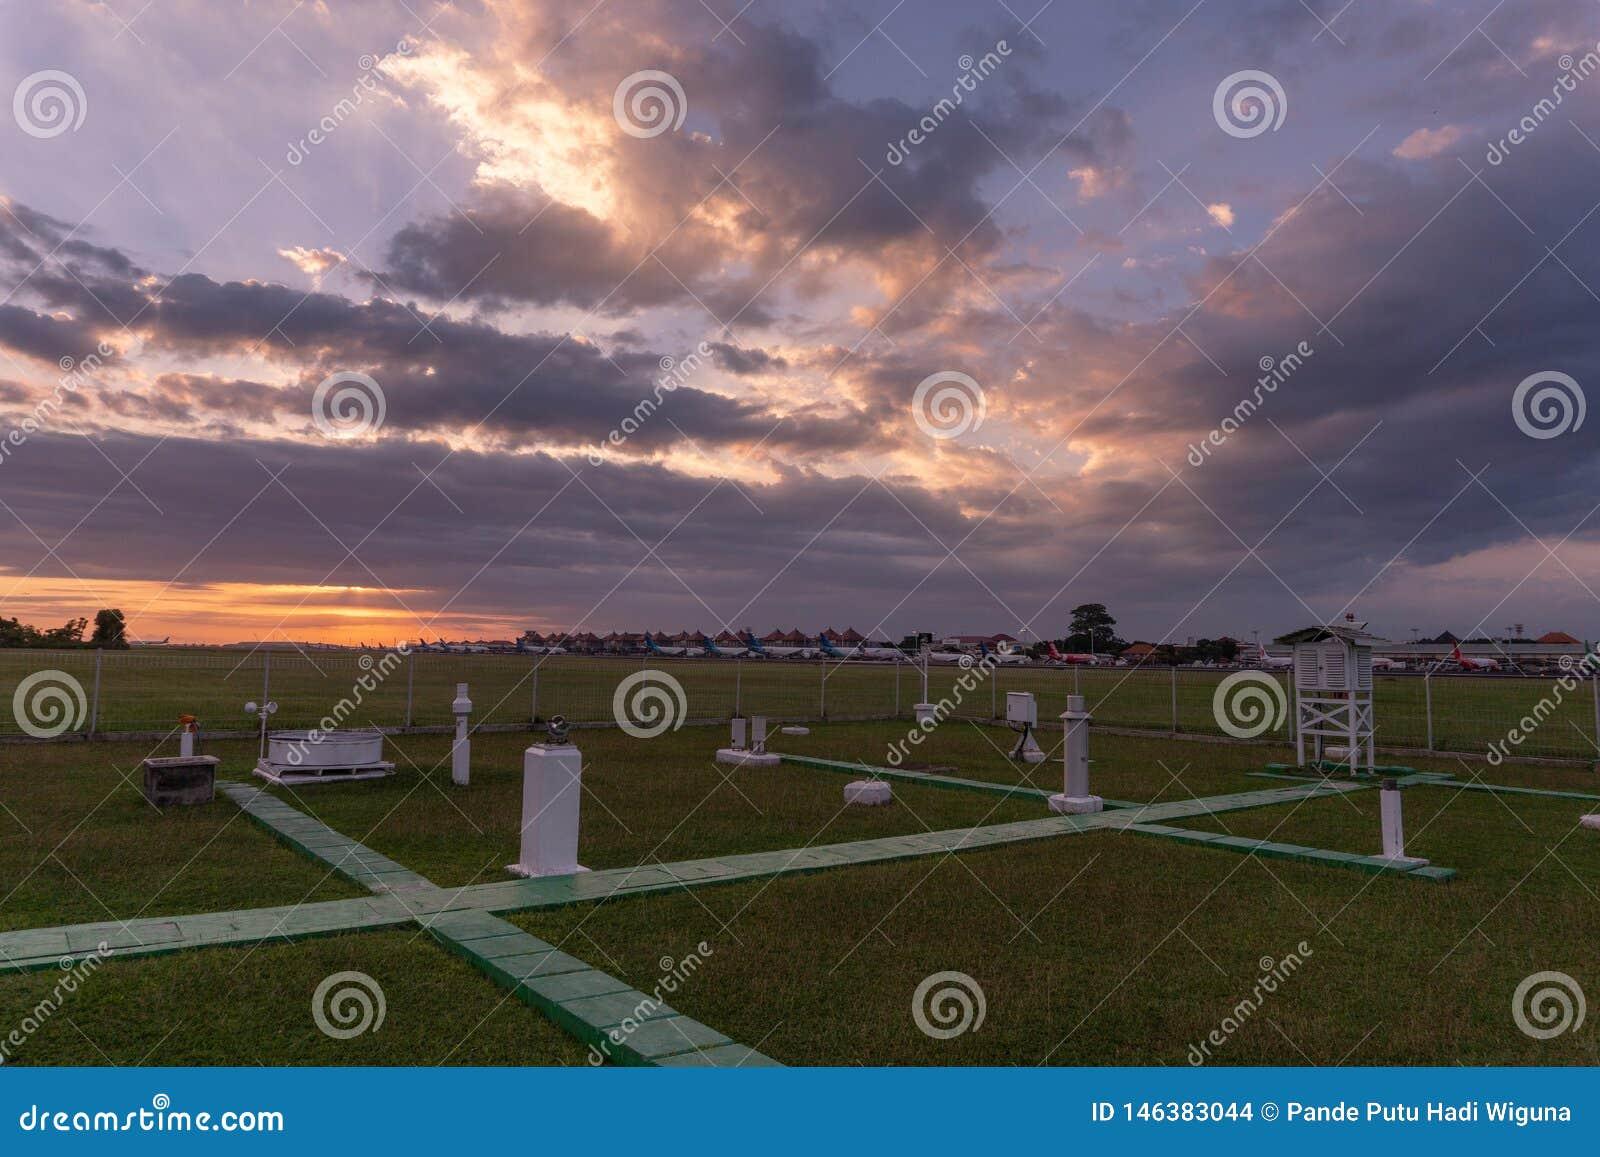 DENPASAR/BALI-APRIL 23 2019: the view of the meteorological tool park at the Ngurah Rai International Airport looks green with